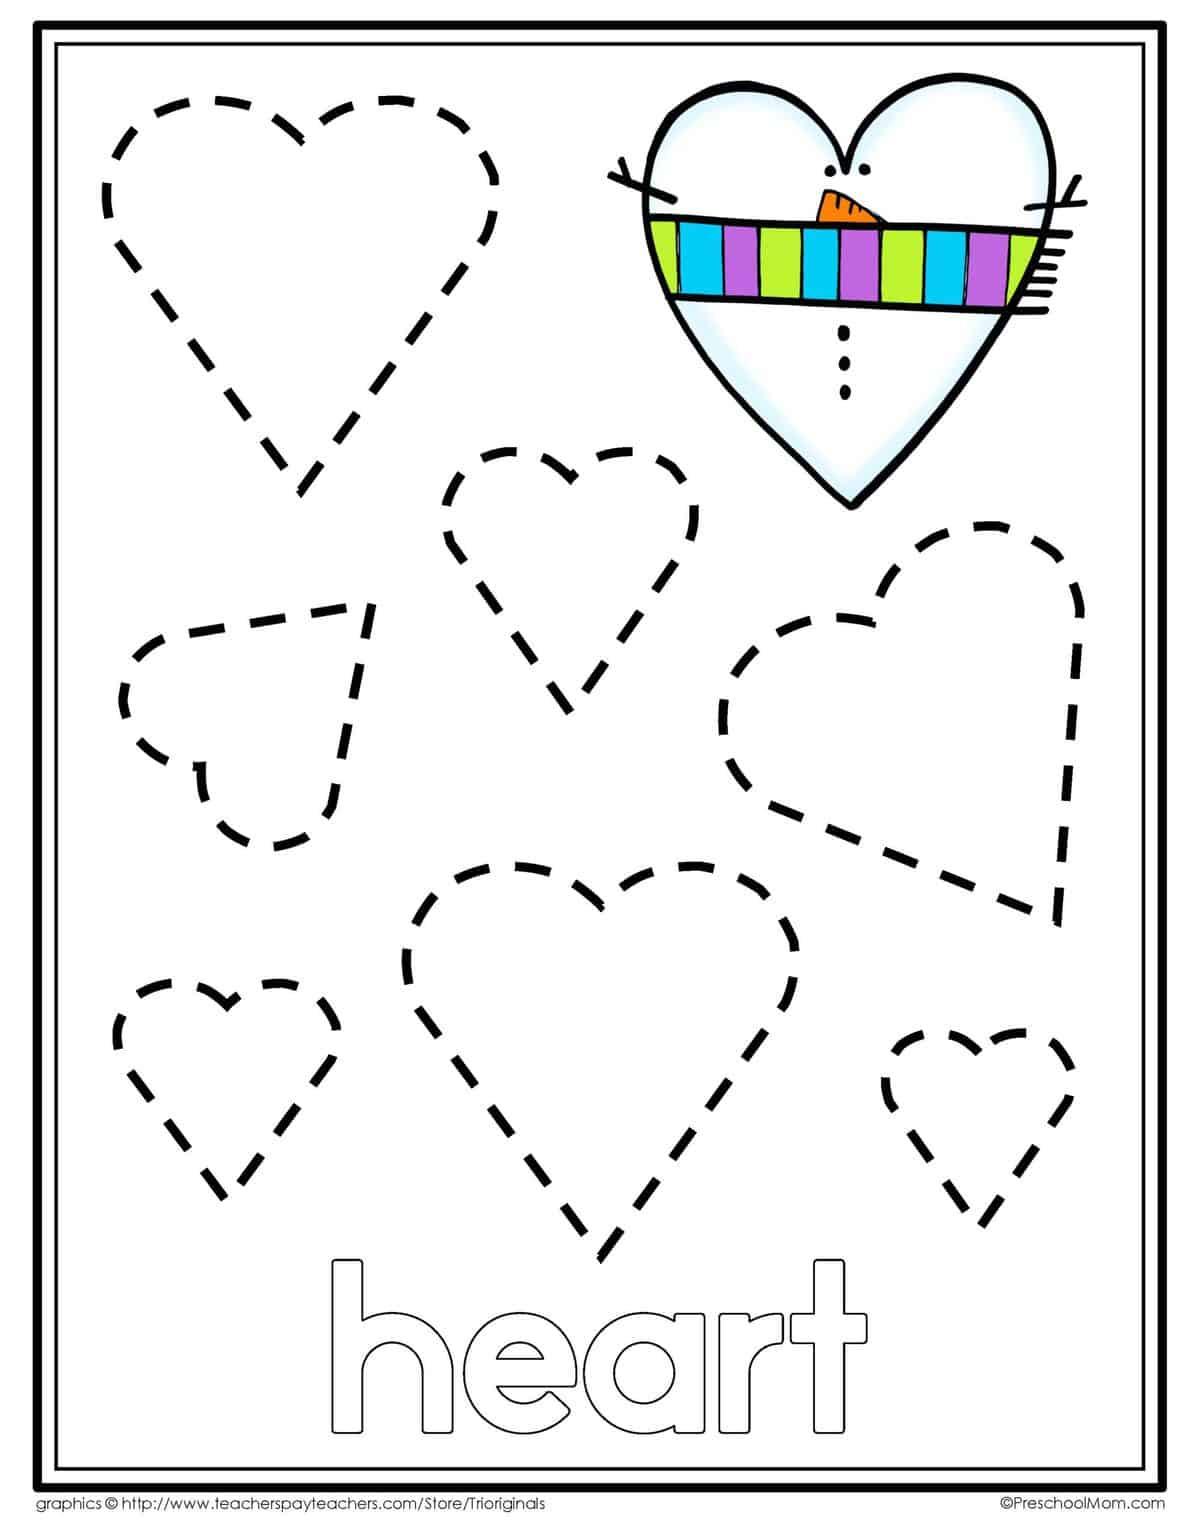 Heart Tracing Worksheets For Preschool